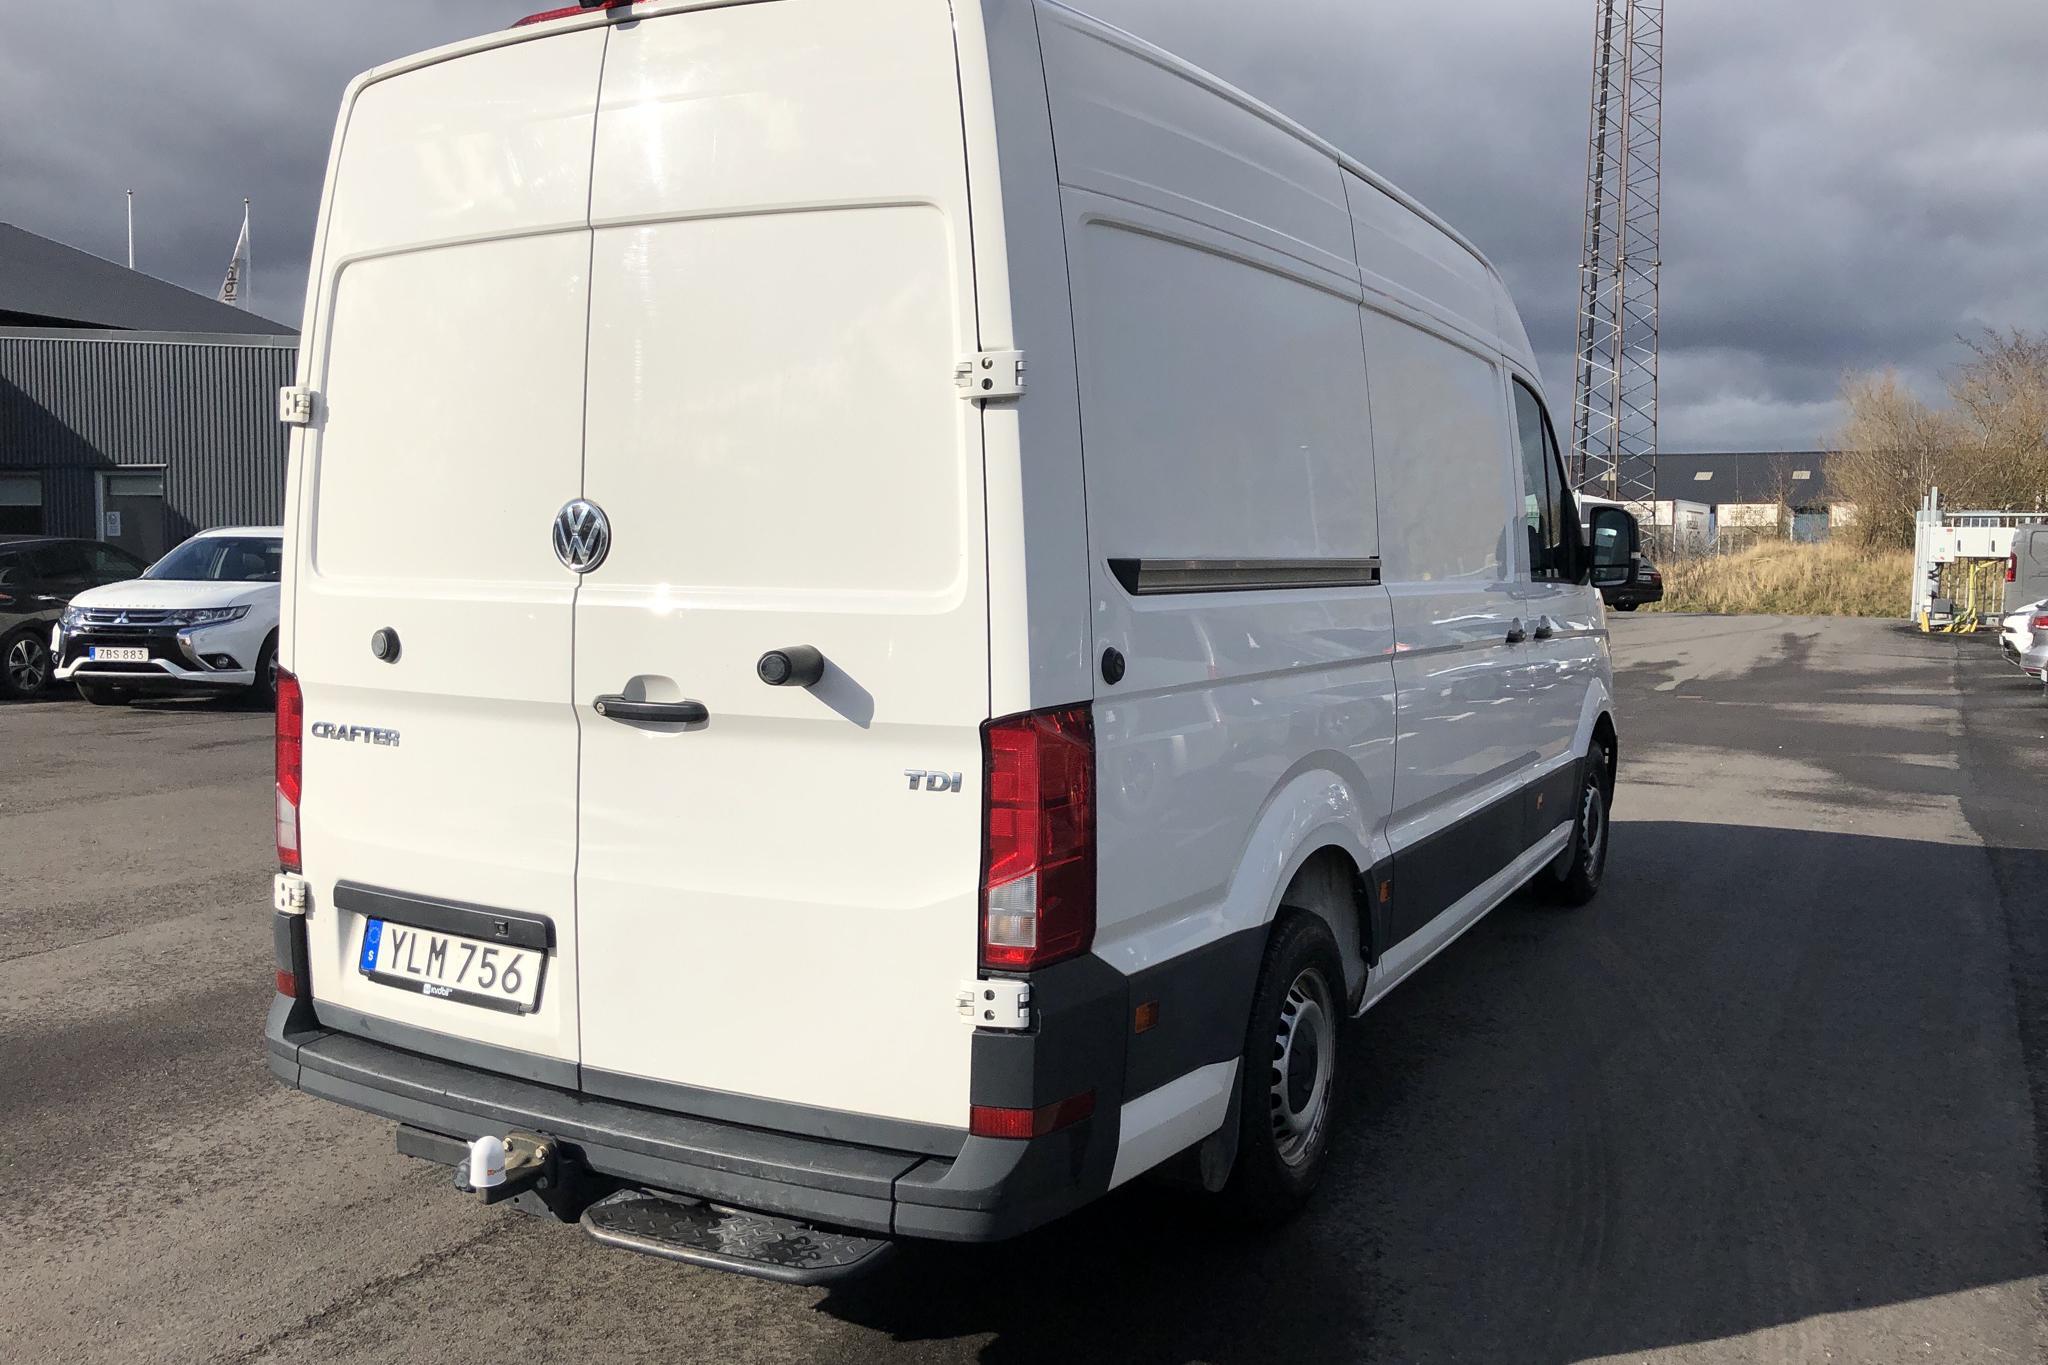 VW Crafter 35 2.0 TDI Skåp (102hk) - 54 780 km - Manual - white - 2017